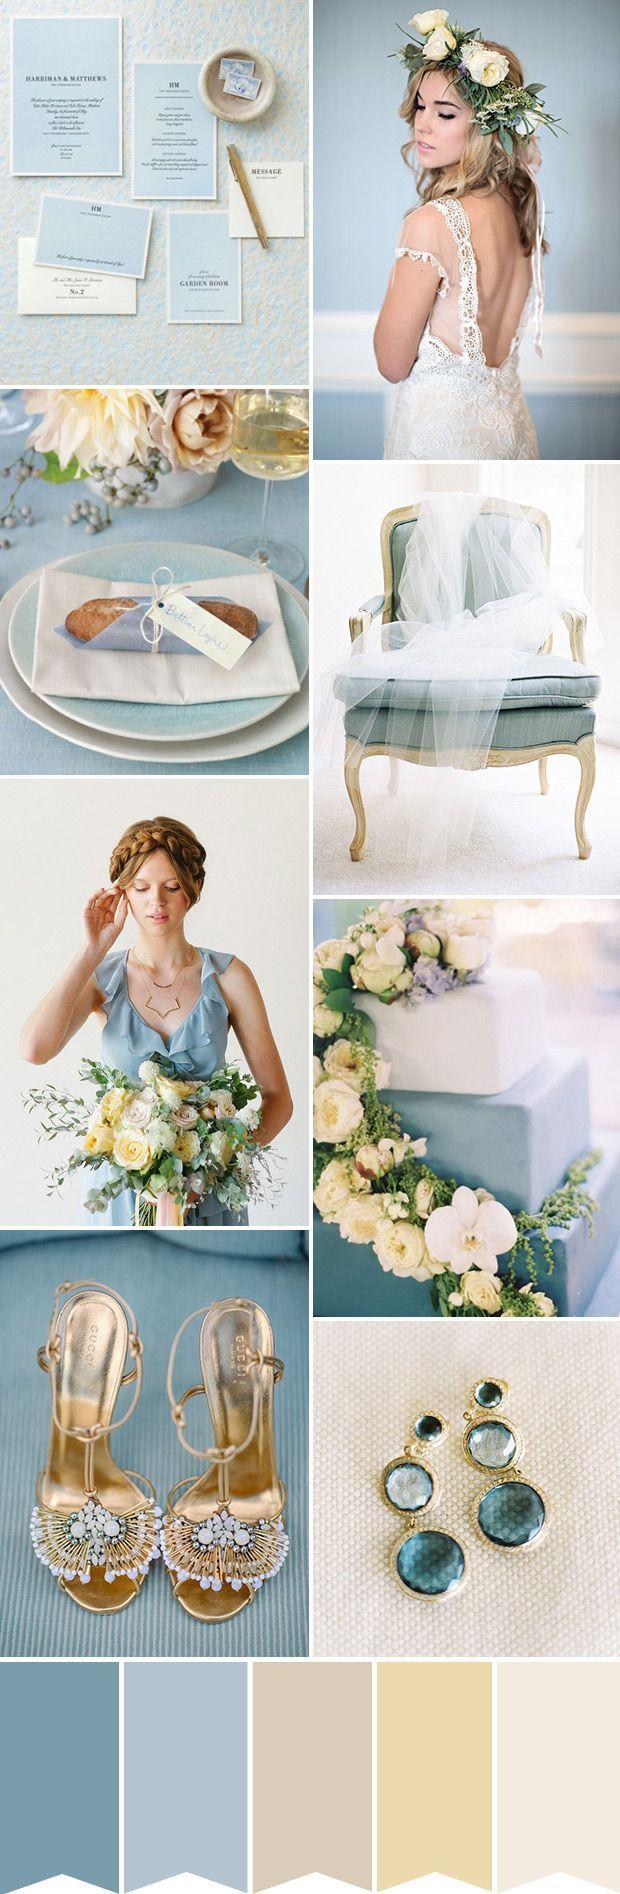 Creating a Romantic Blue and Cream Wedding Theme